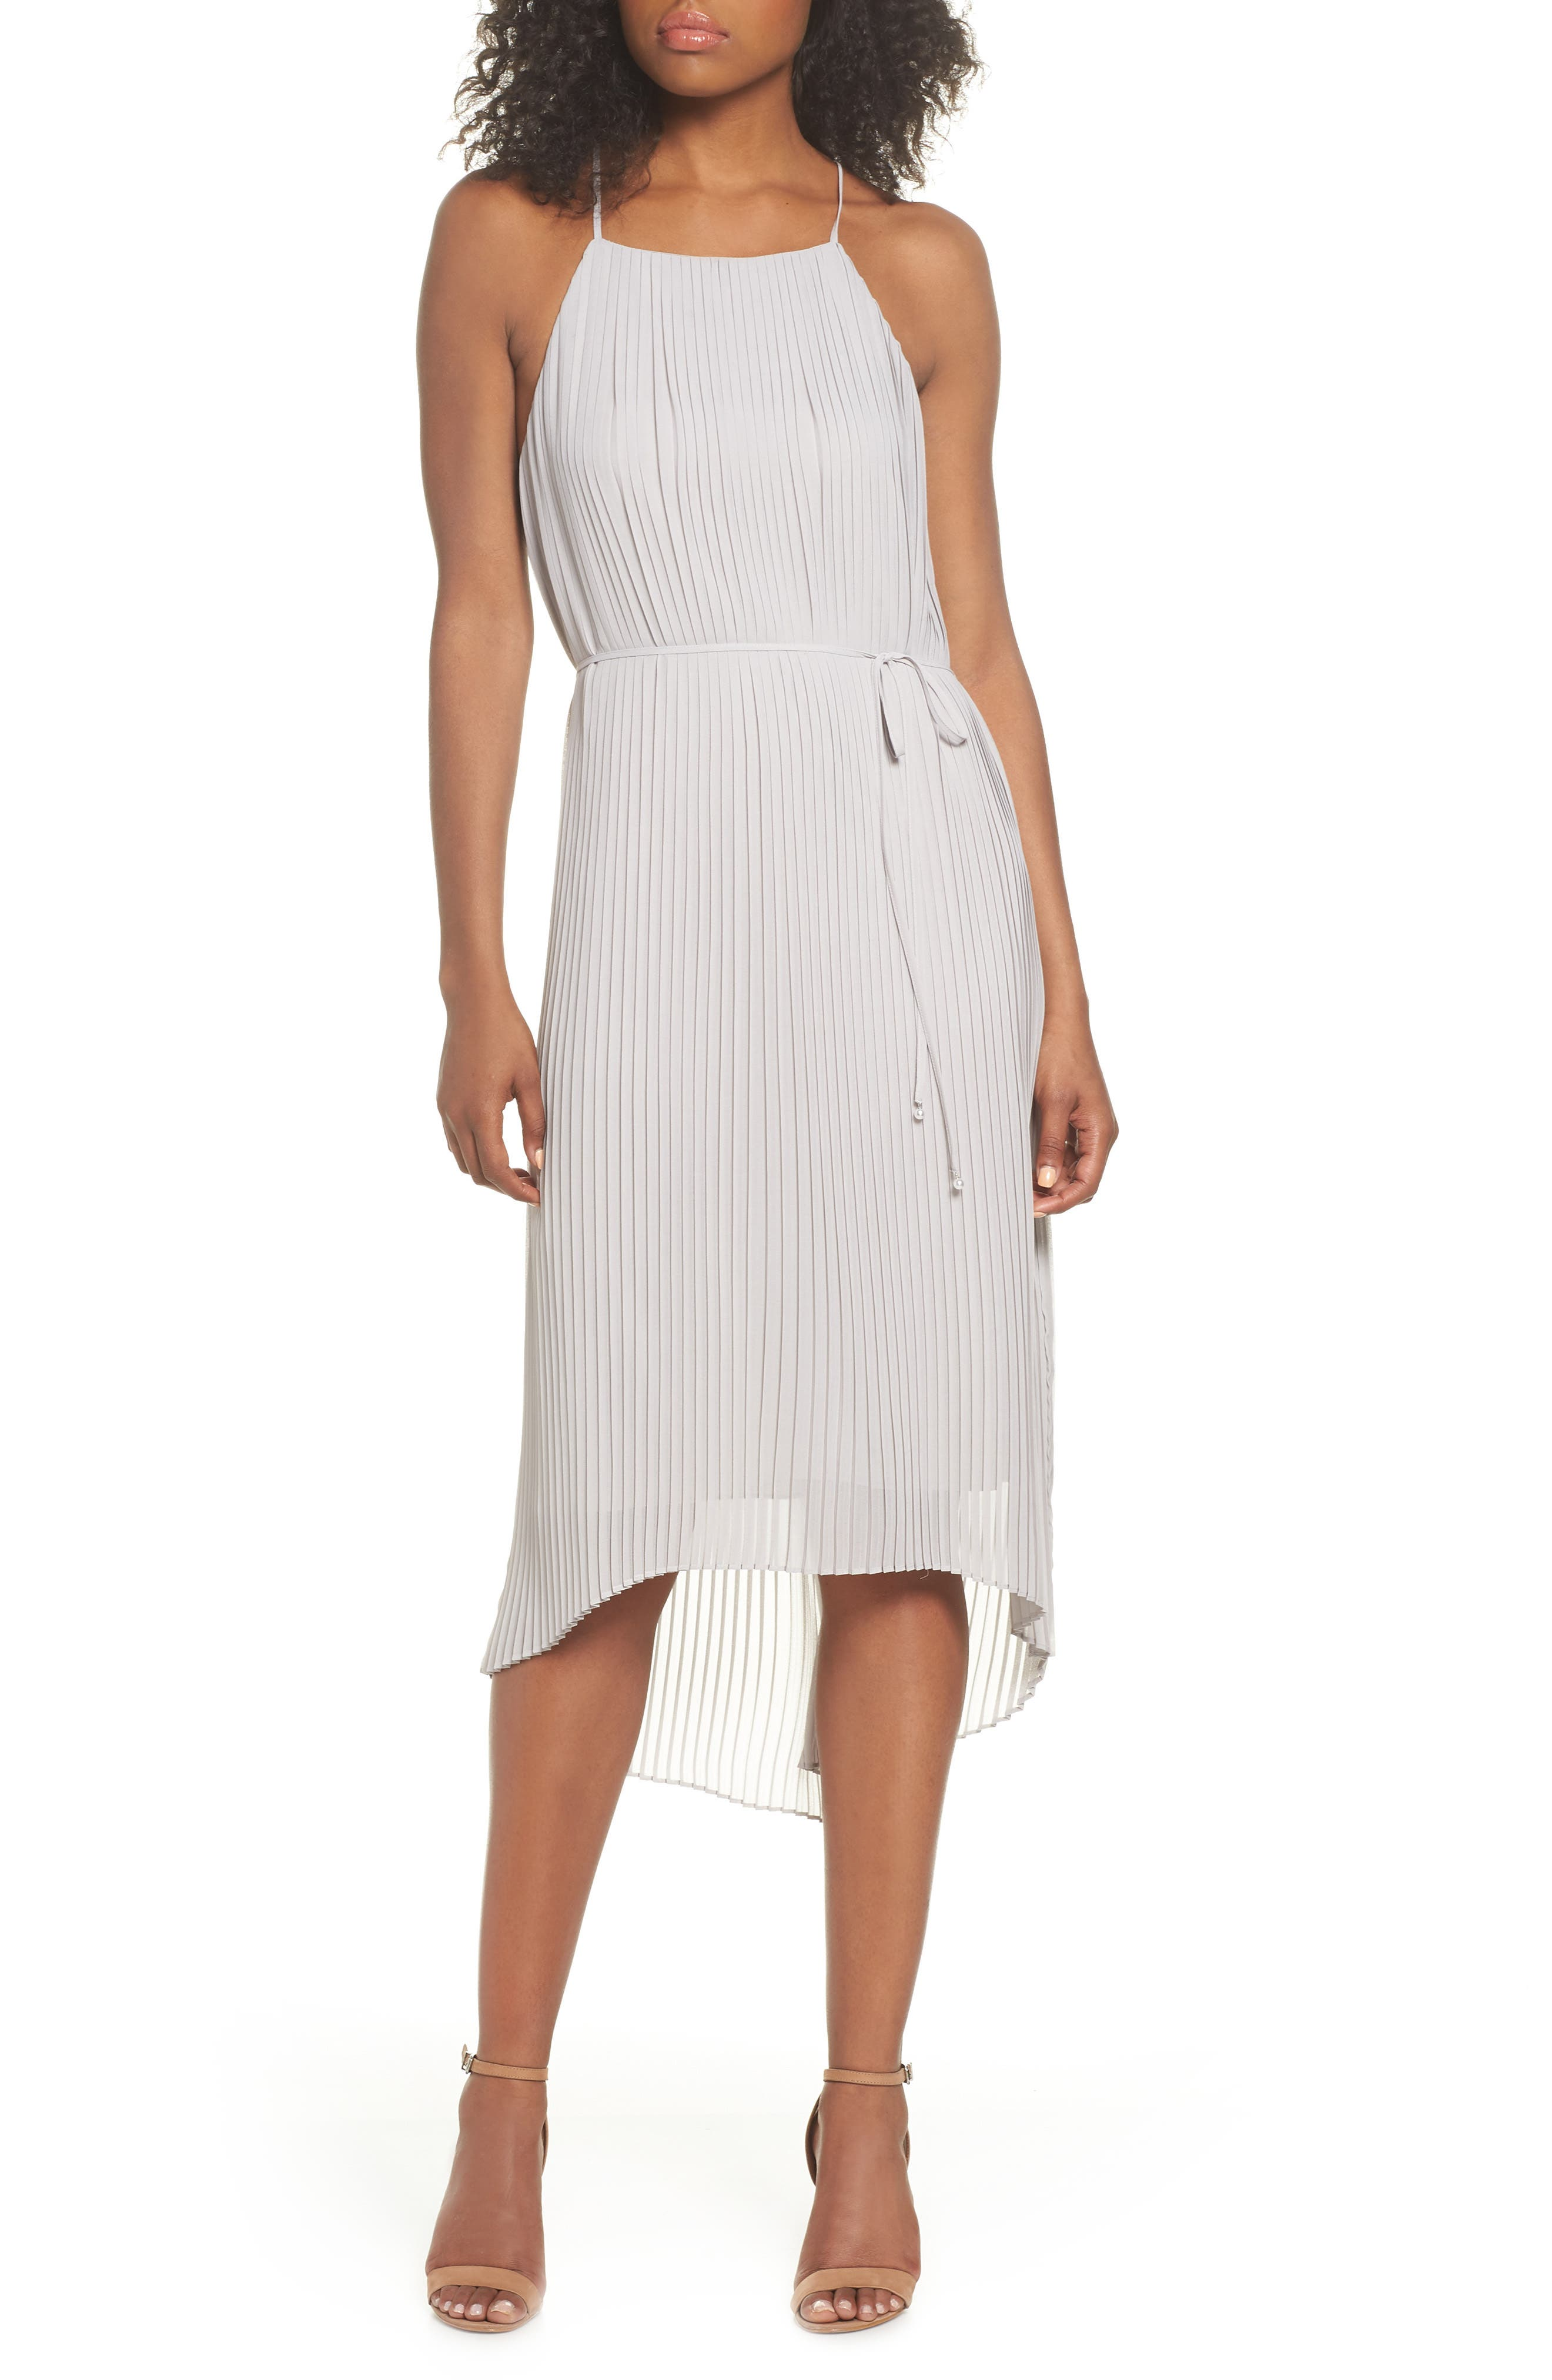 SAM EDELMAN Pleated Midi Dress, Main, color, 077